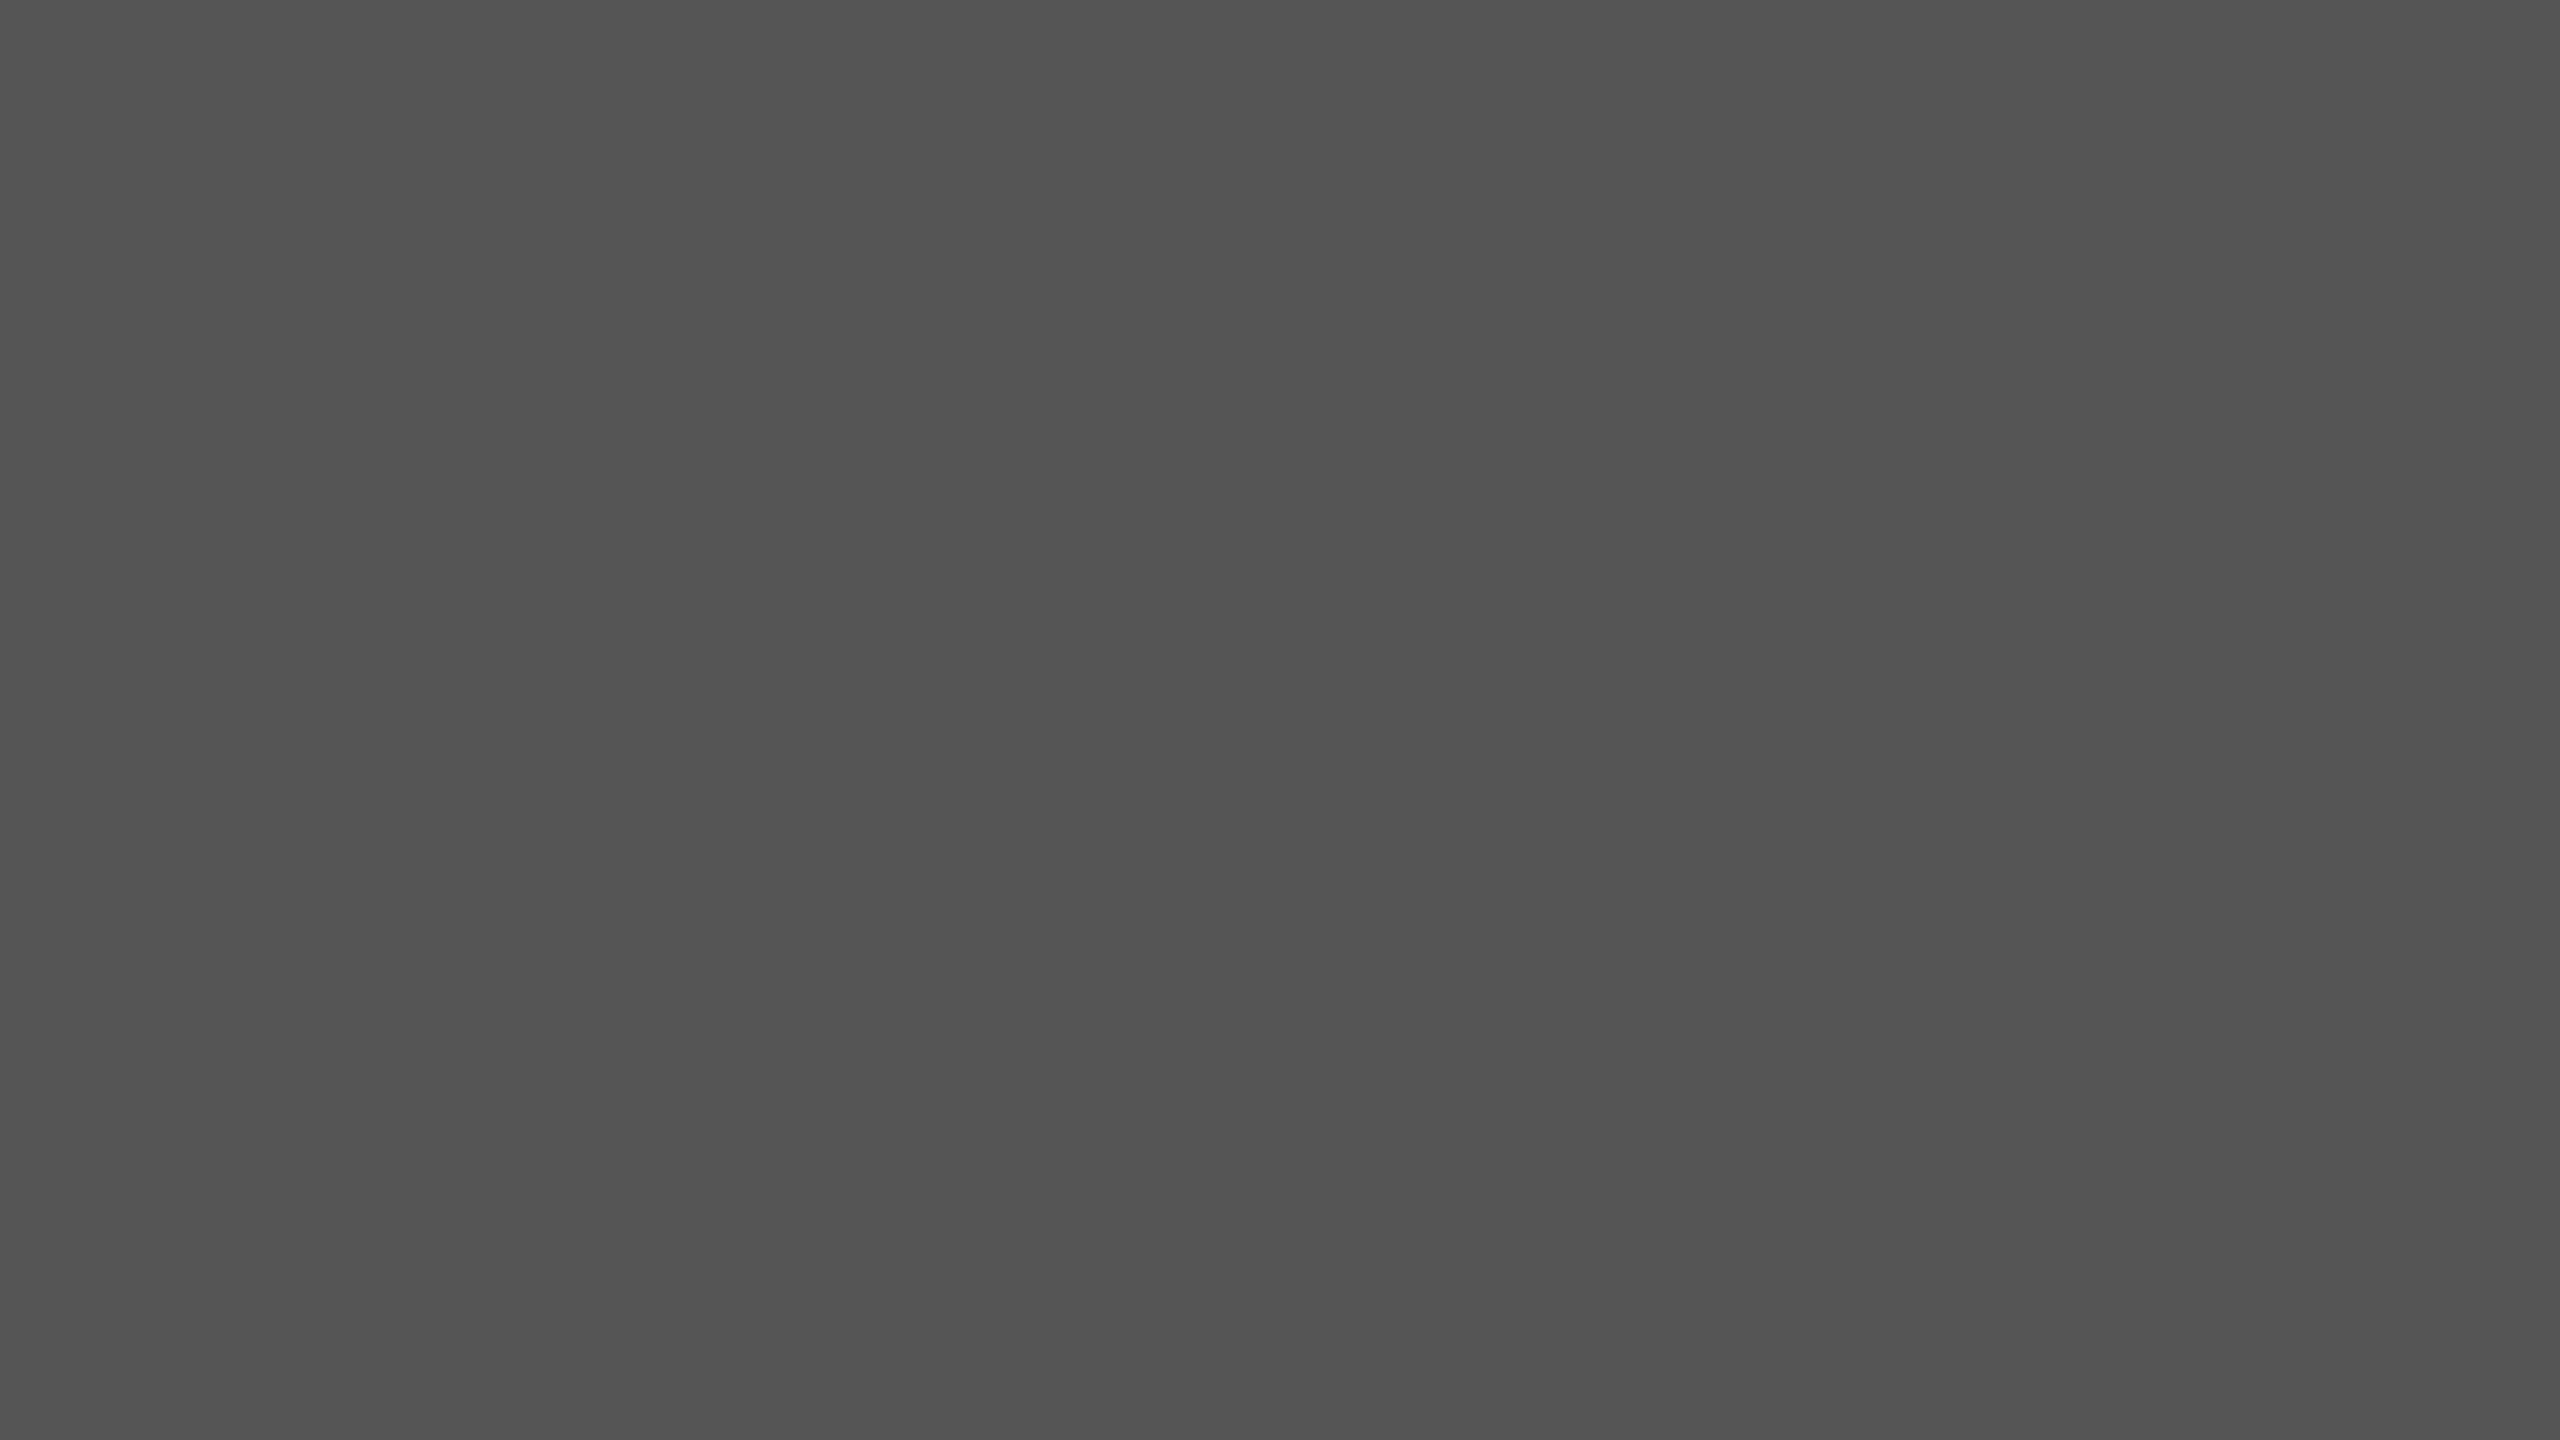 grey background wallpaper wallpapersafari. Black Bedroom Furniture Sets. Home Design Ideas